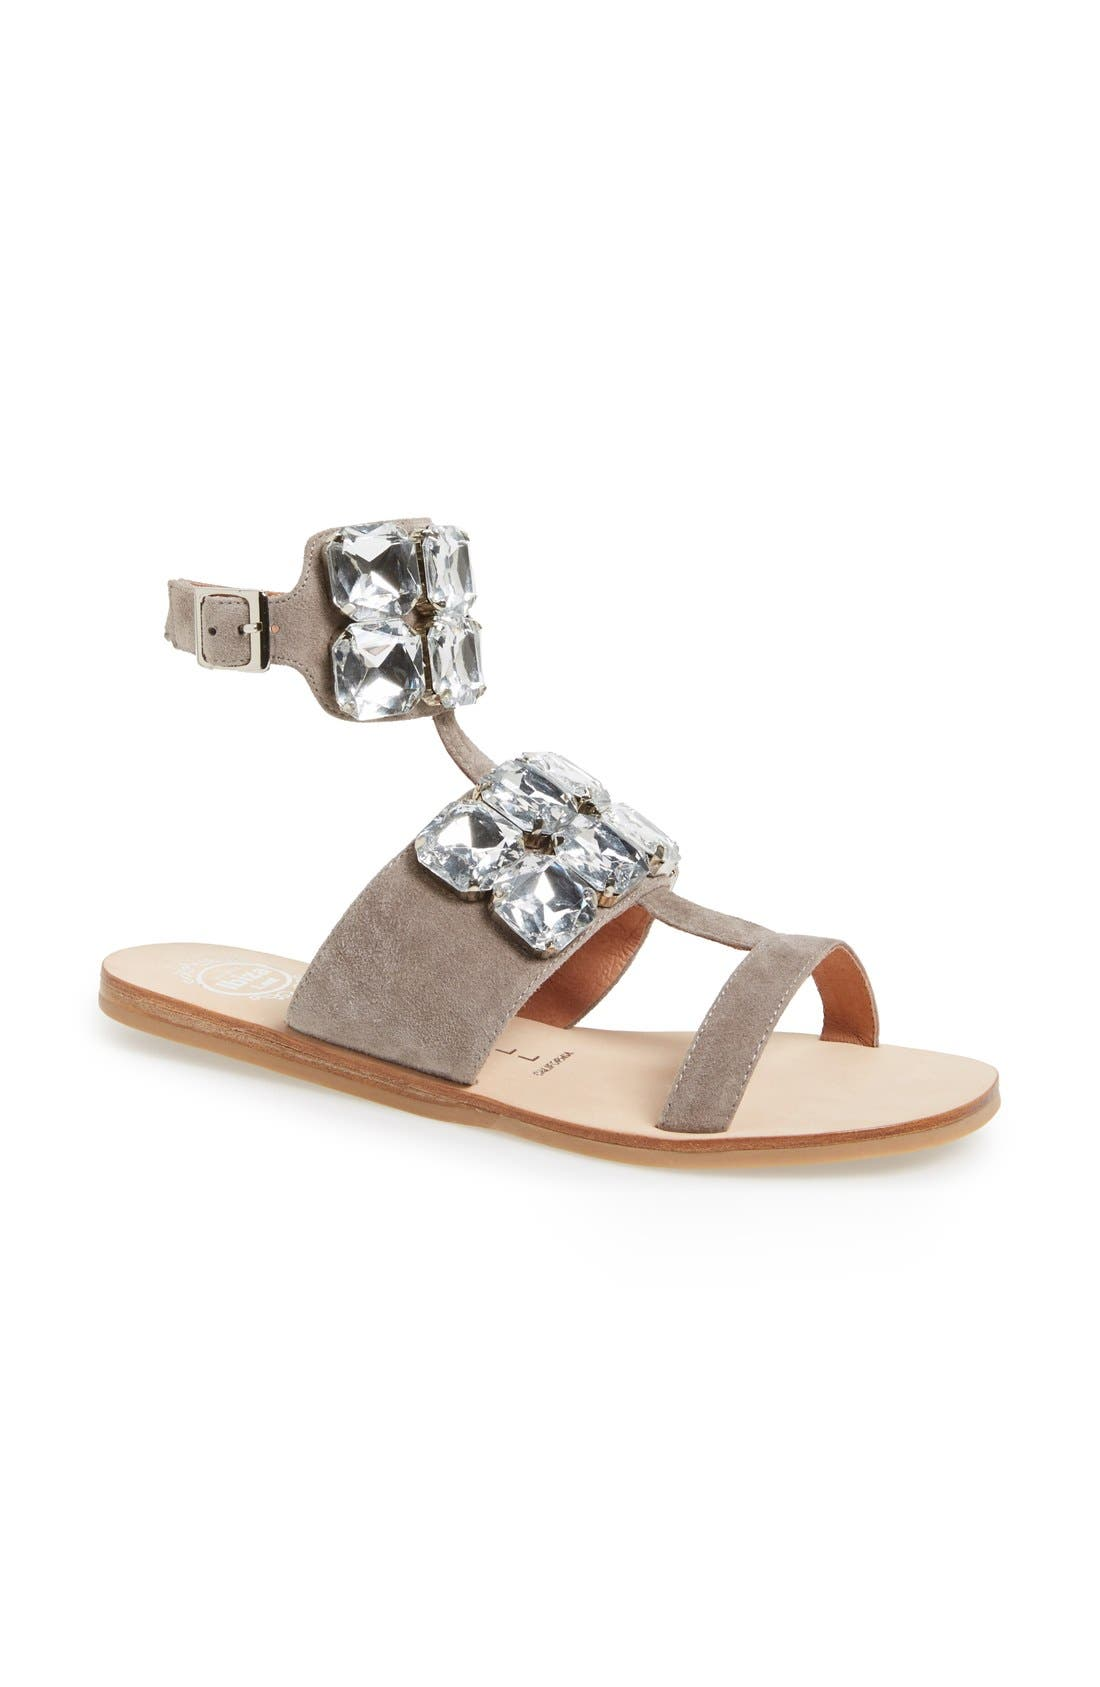 Main Image - Jeffrey Campbell 'Sabita' Jeweled Suede Ankle Strap Sandal (Women)